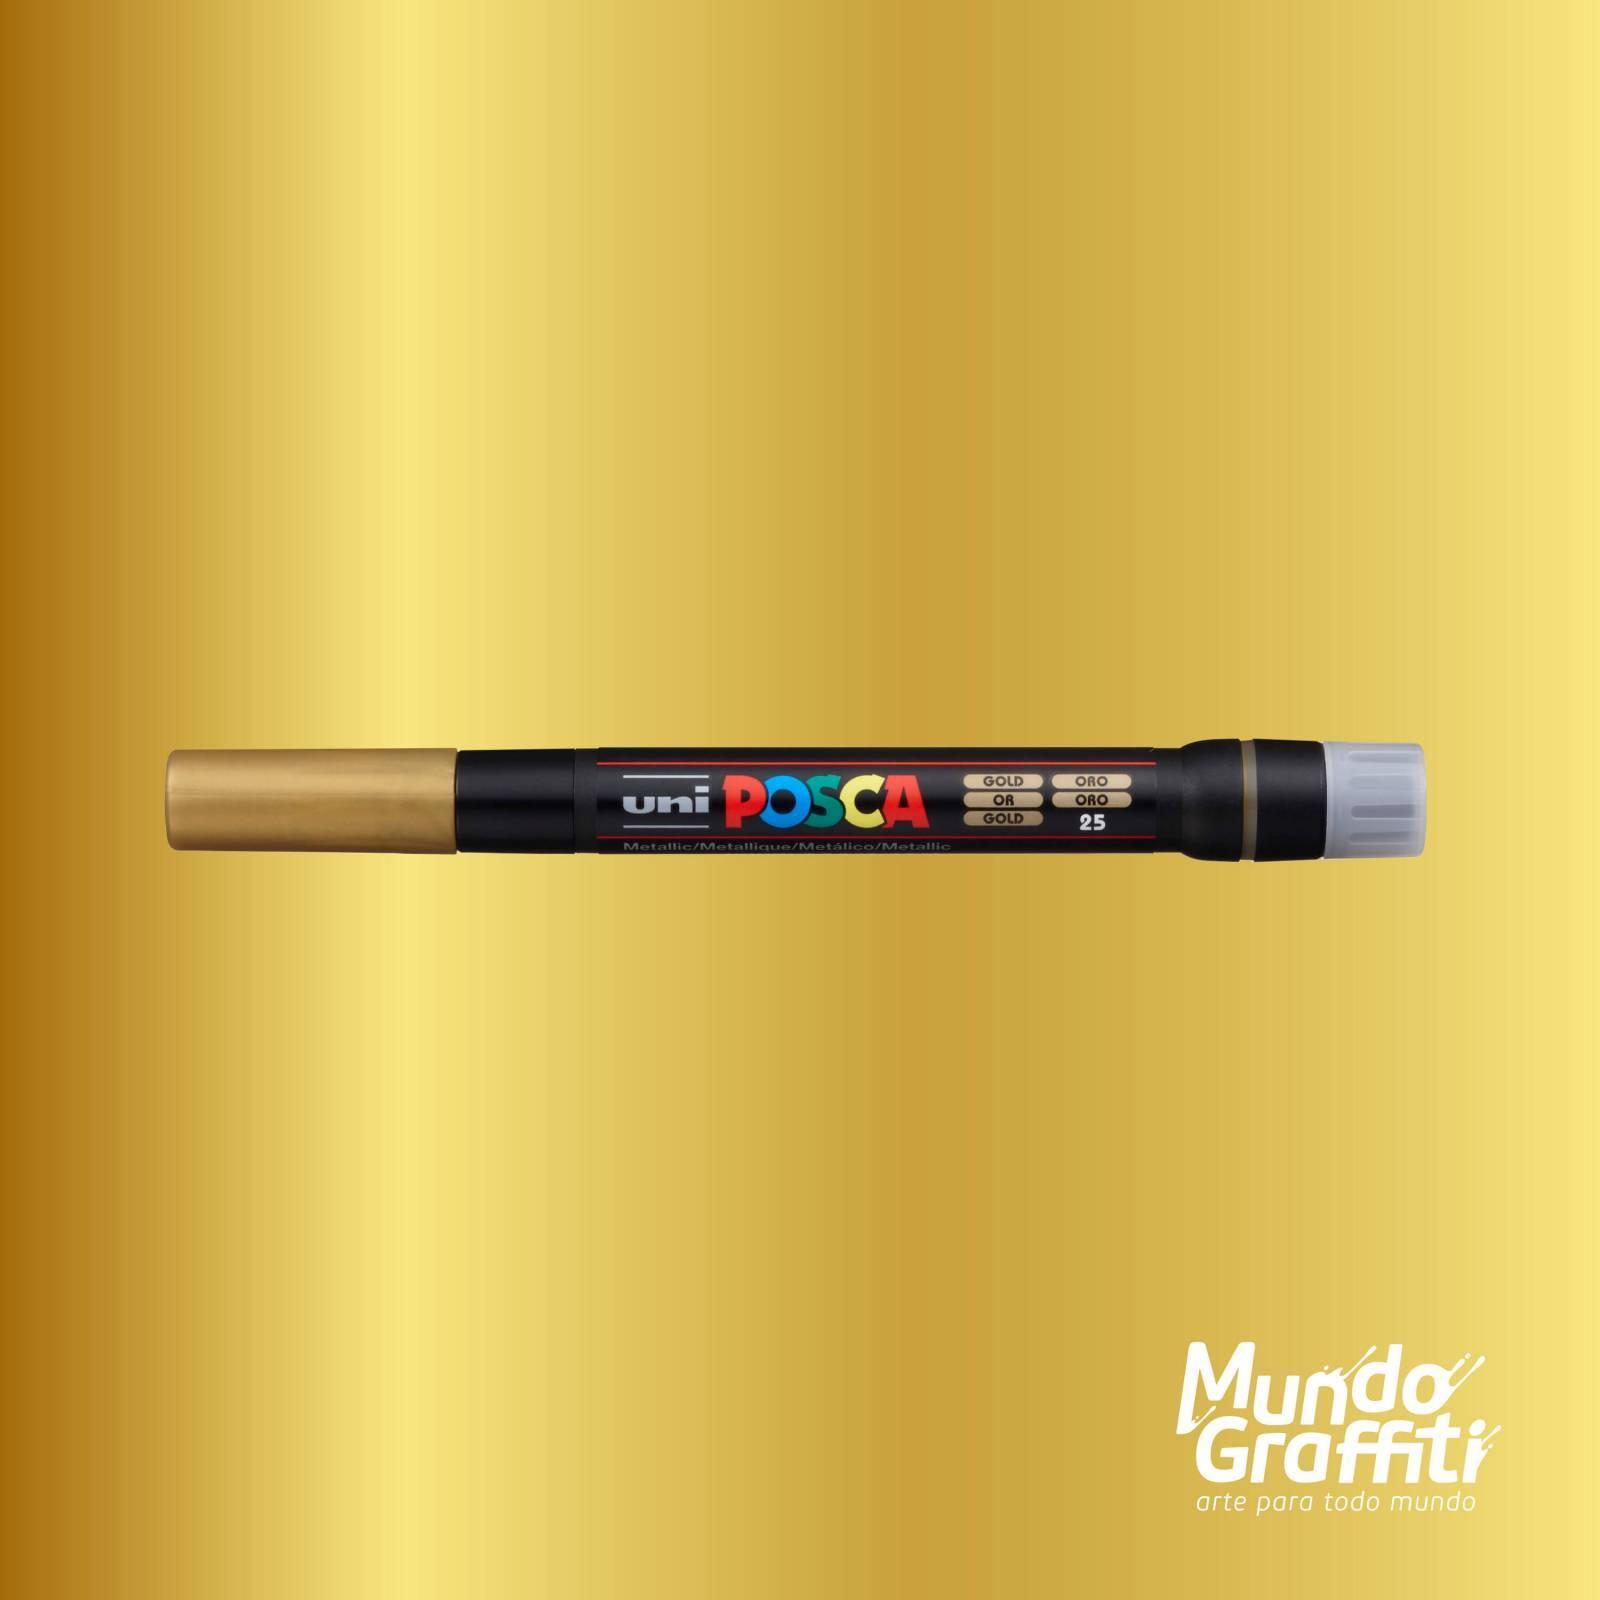 Caneta Brush Posca PCF 350 Ouro - Mundo Graffiti